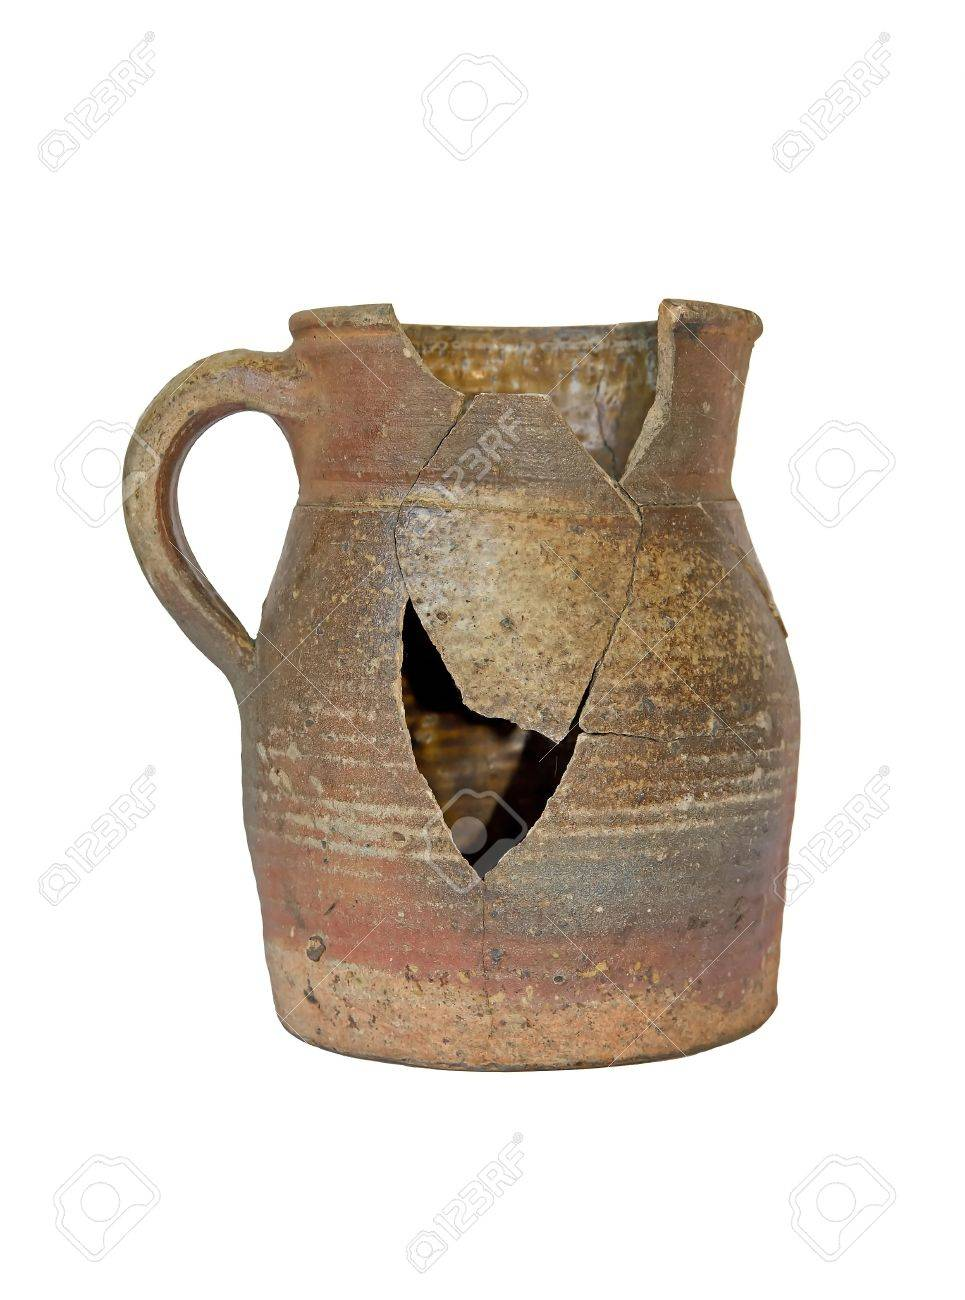 Broken pot a symbol of violence and failure stock photo picture broken pot a symbol of violence and failure stock photo 11990116 buycottarizona Choice Image